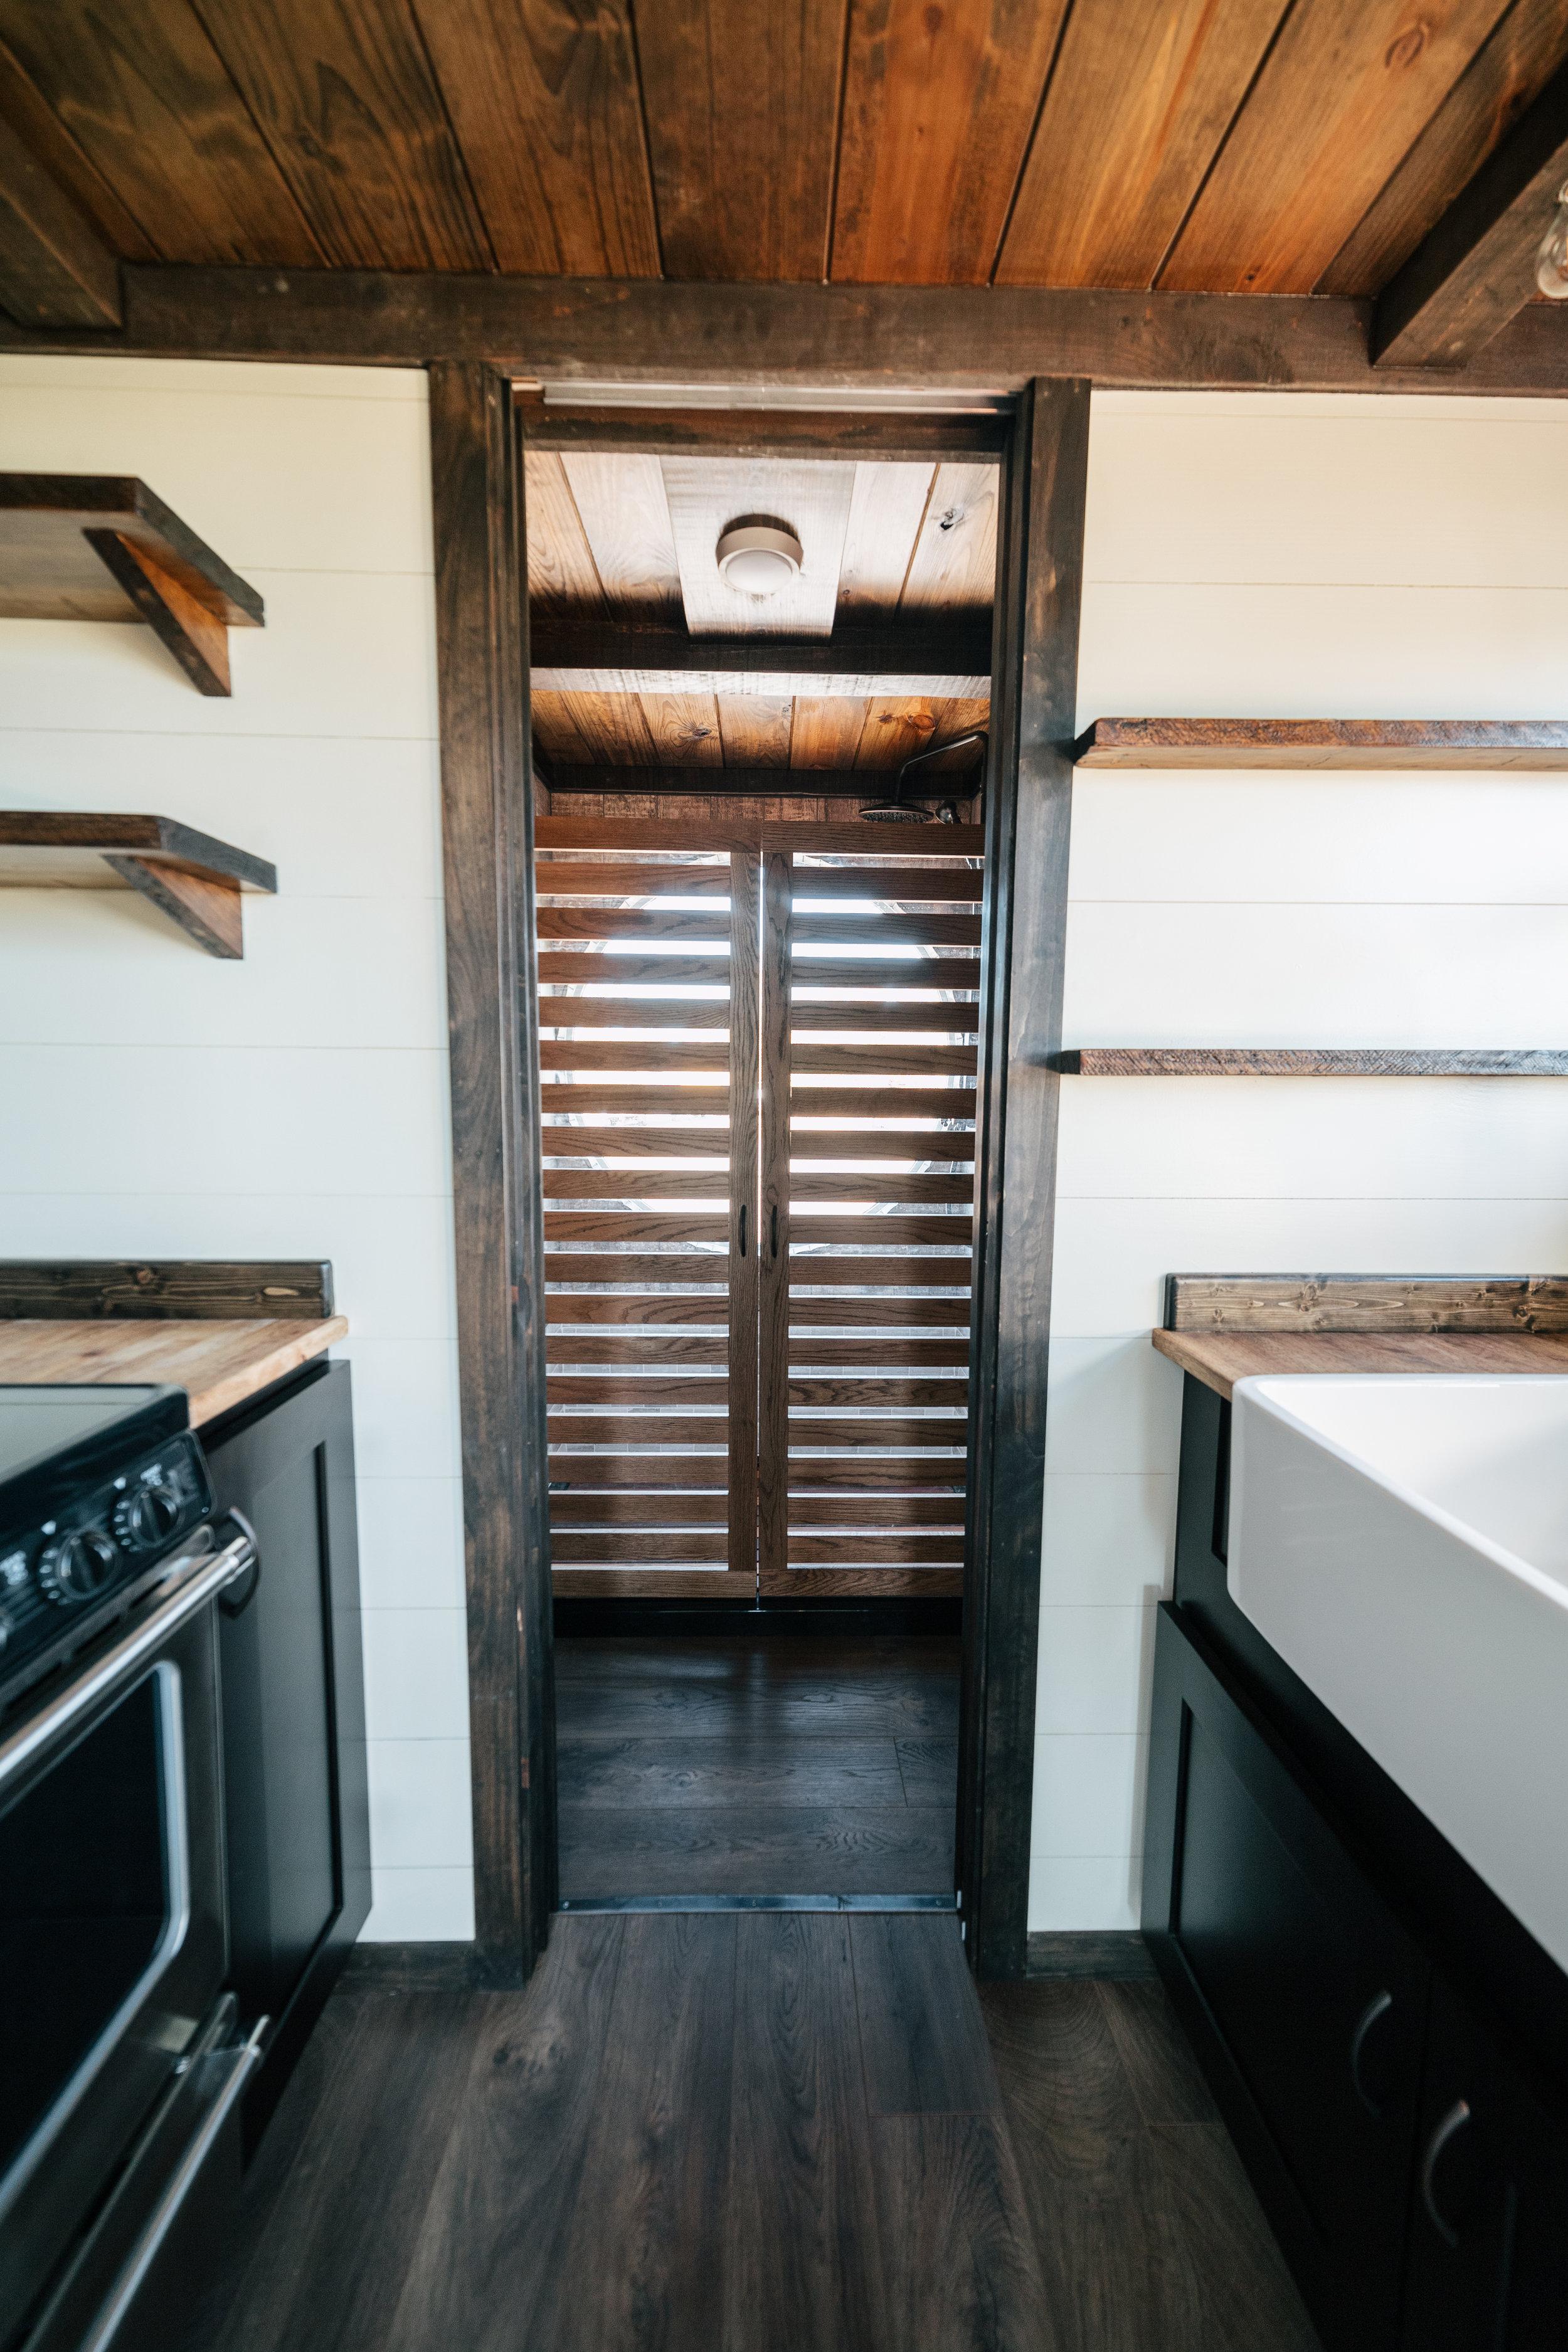 The Silhouette by Wind River Tiny Homes - patina steel pocket door, shaker style cabinets, oak wood slat/Plexiglass shower stall doors